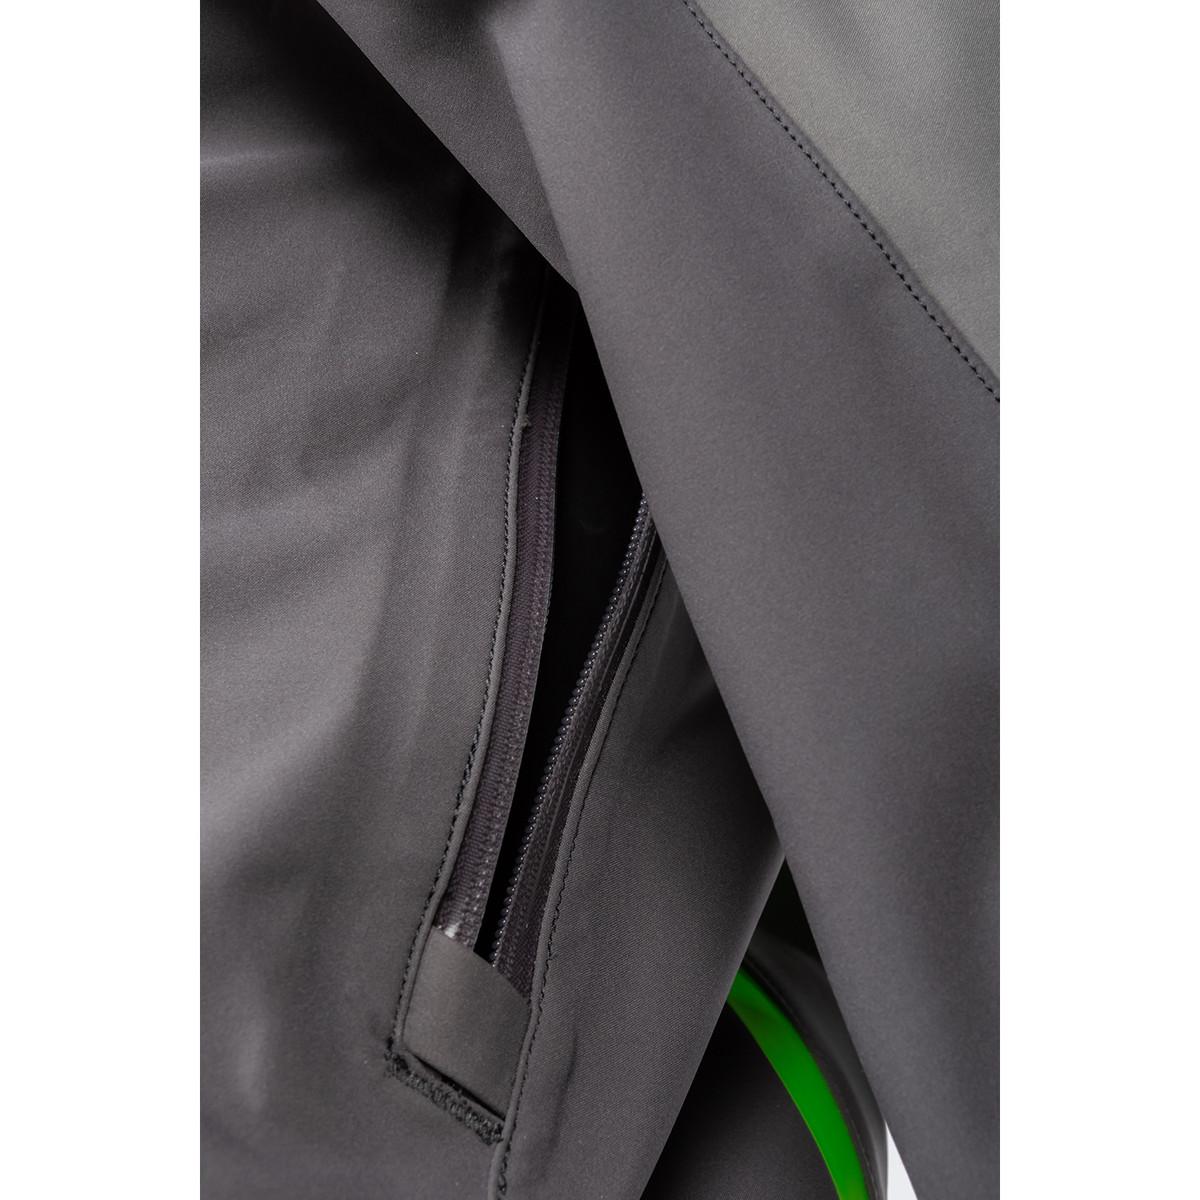 Enduro S4 Jacket Castlerock Gray - Electrik Gecko Zipper Detail